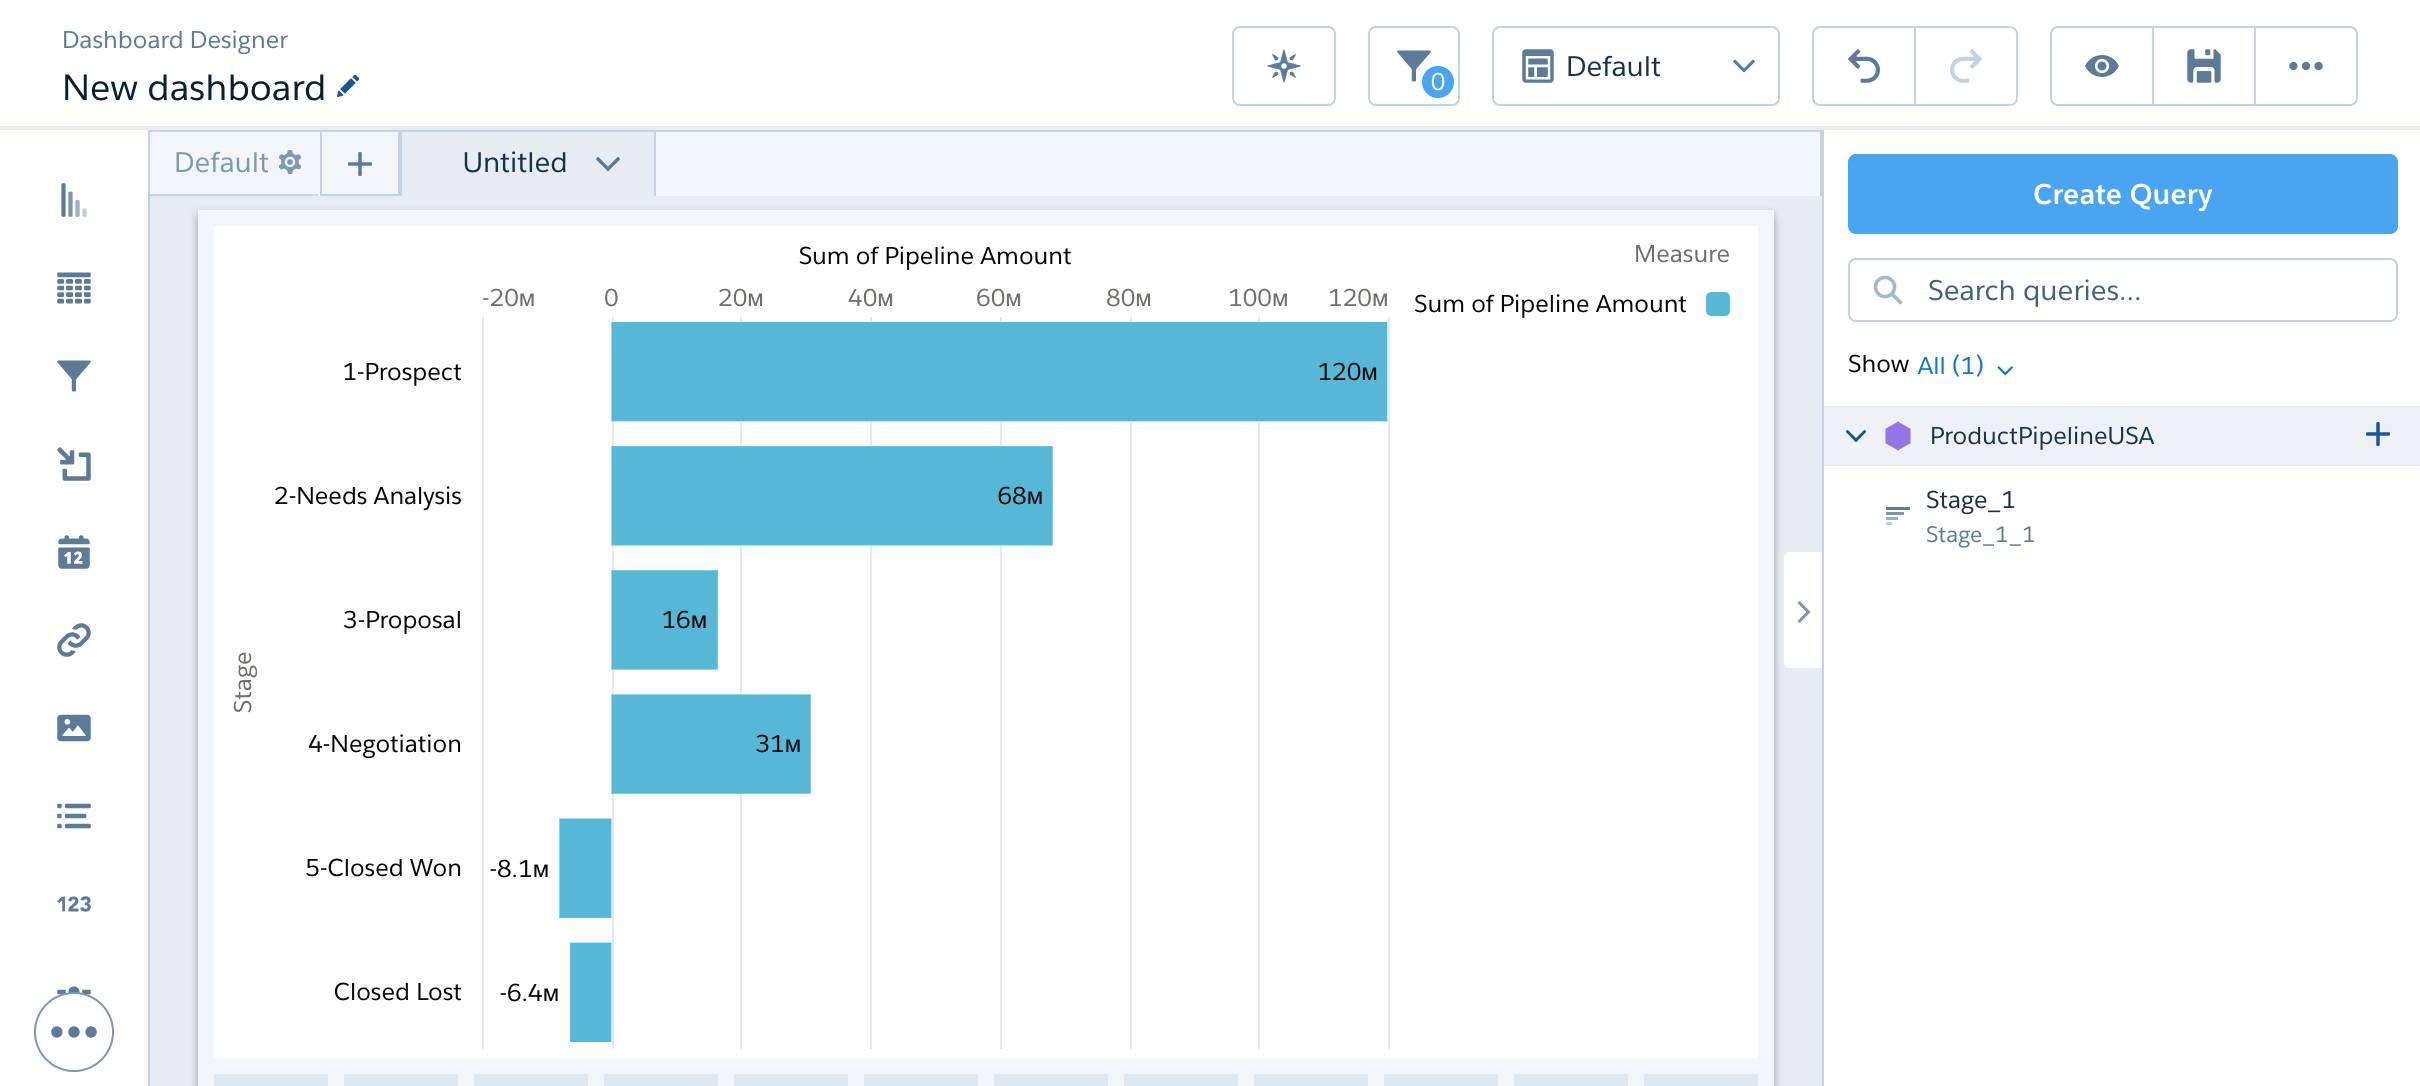 Pipeline stages bar chart in dashboard designer